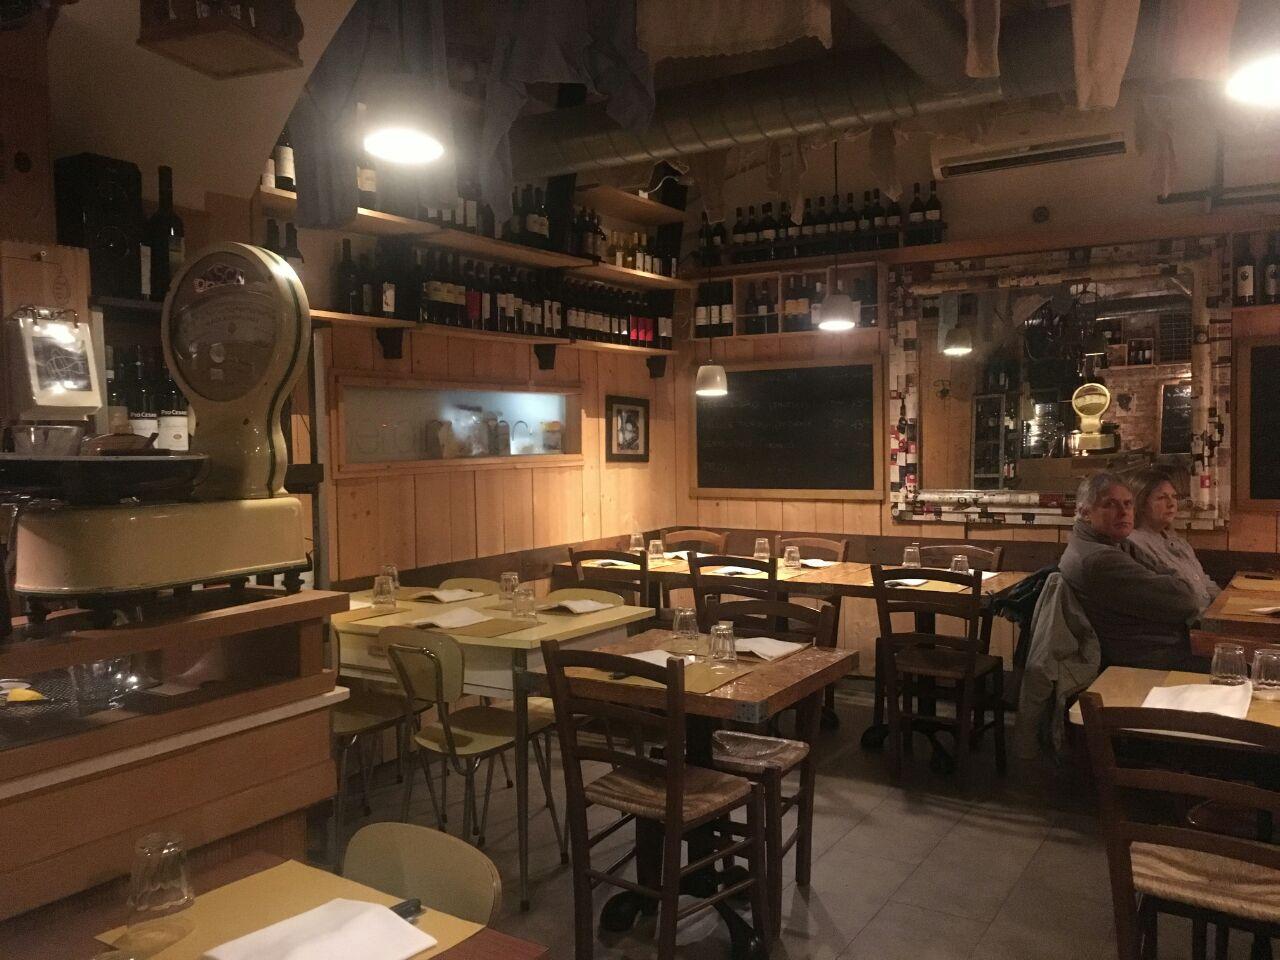 Merlino Bottega D Arte perdincibacco reviews: food & drinks in lazio rome– trip